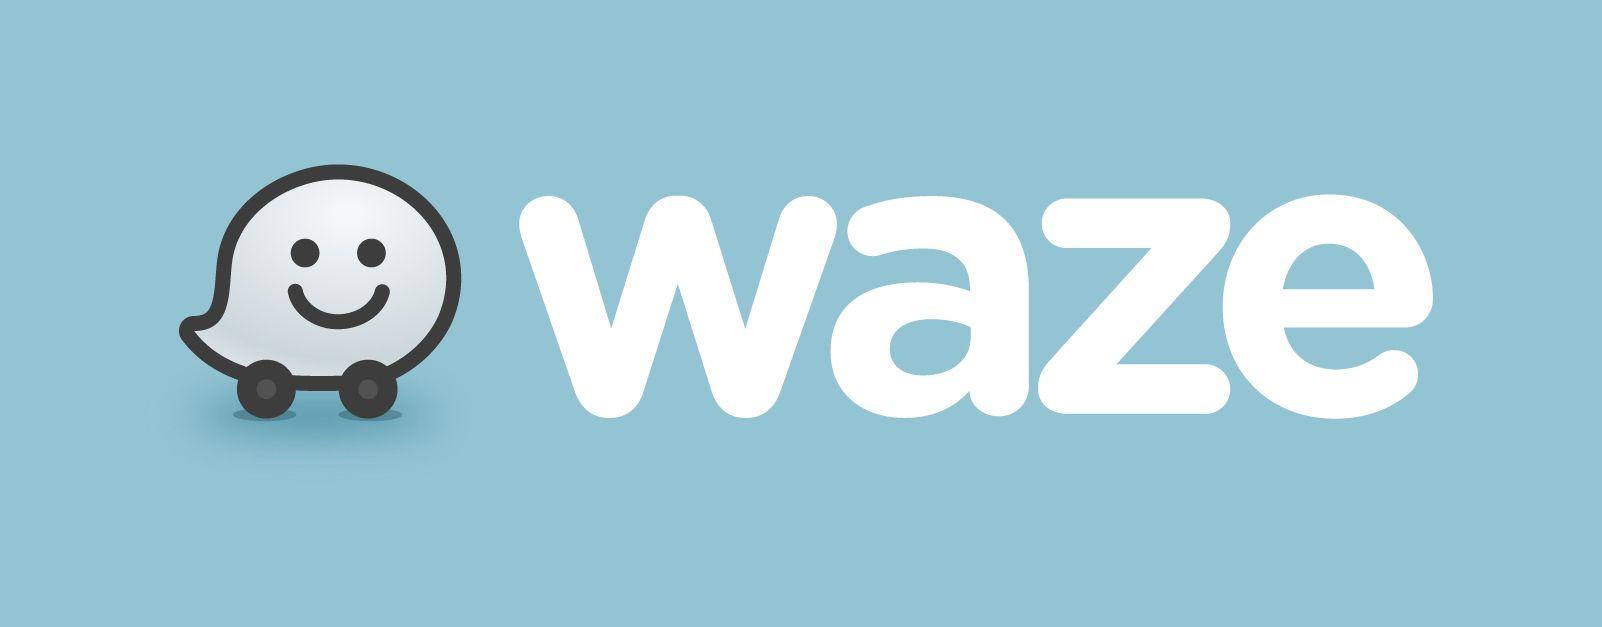 waze-logo-compressed